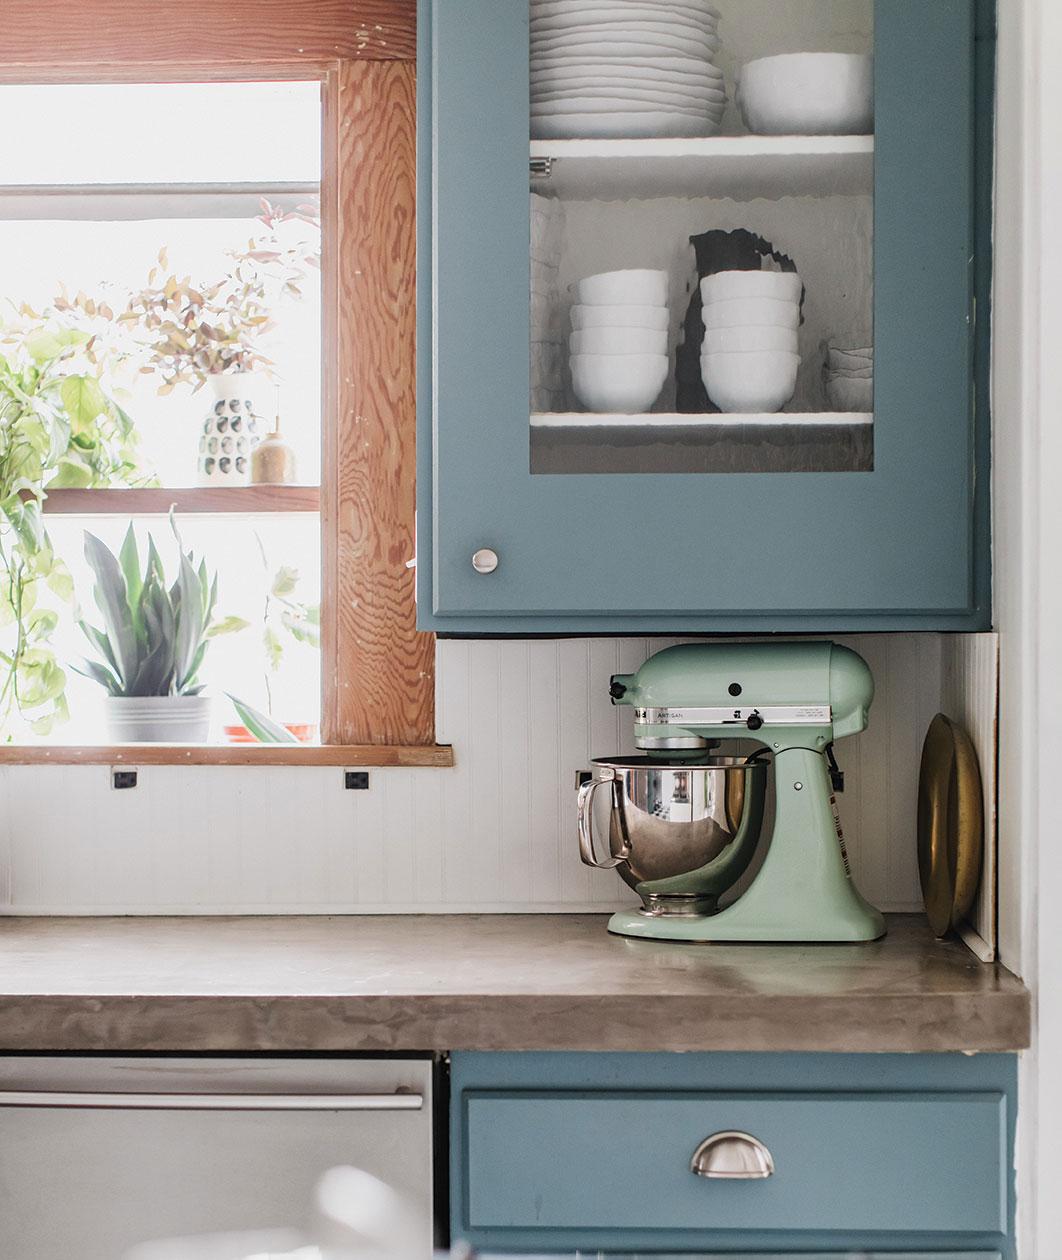 DIY kitchen changes Ashley Goldman thegoldhive.com kitchen countertops concrete